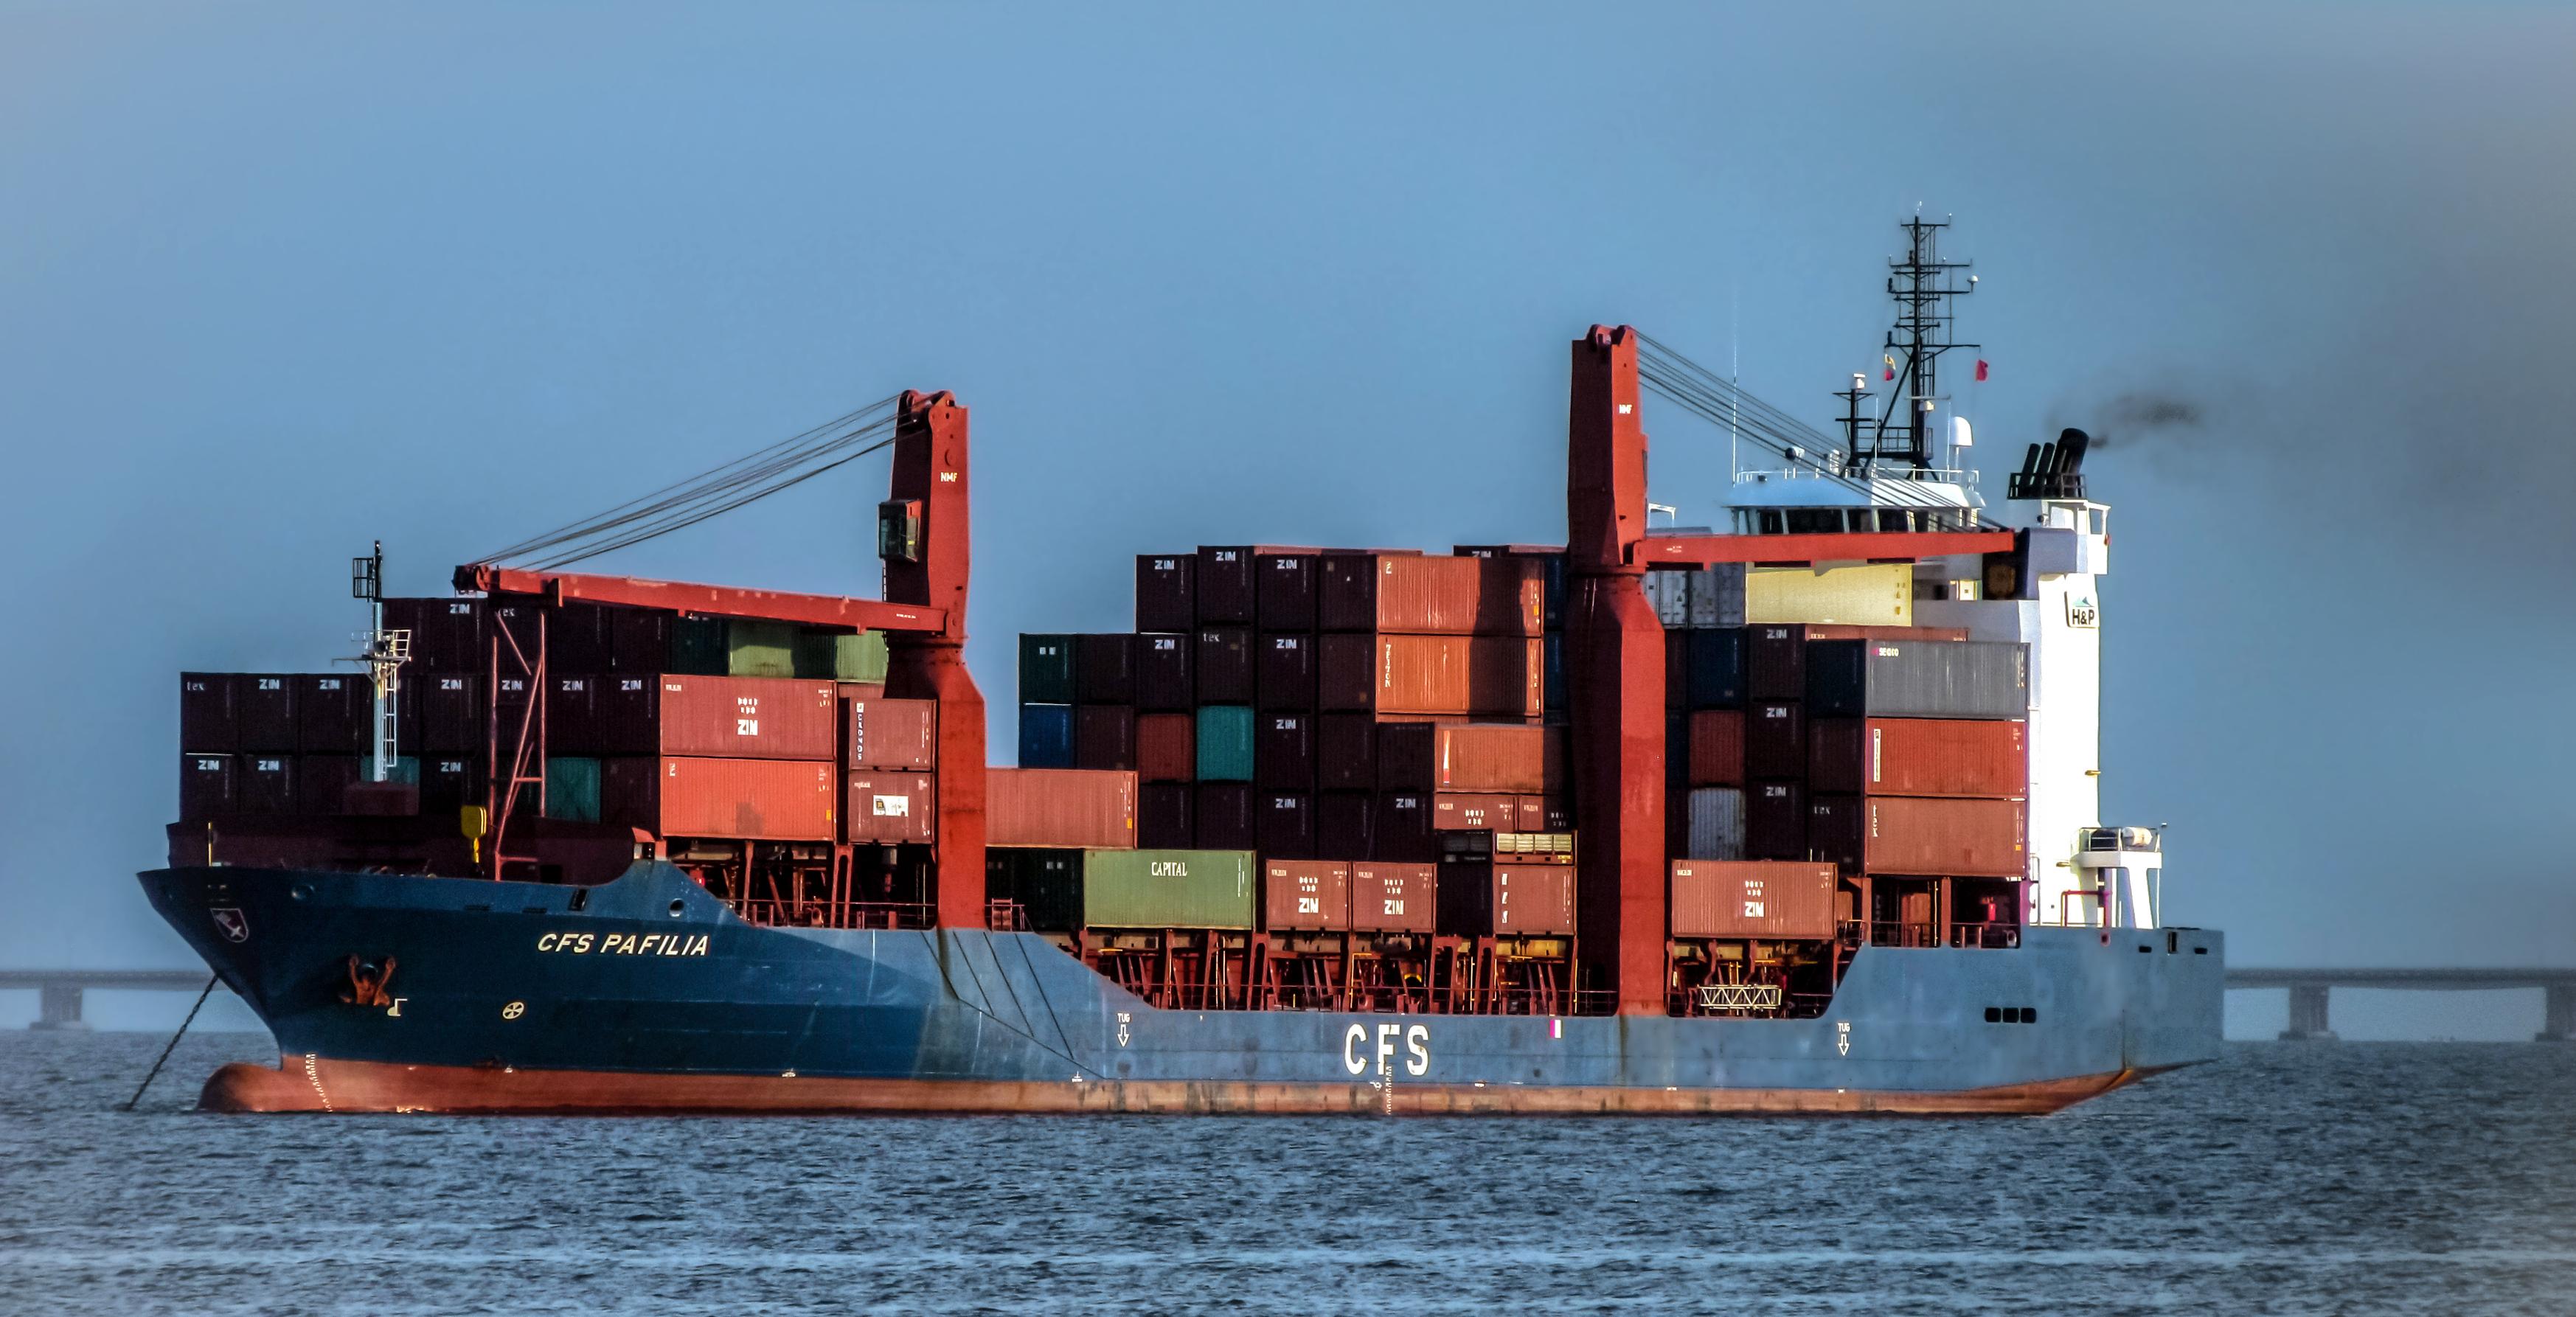 Expertos destacan reducción de las flotas de carga